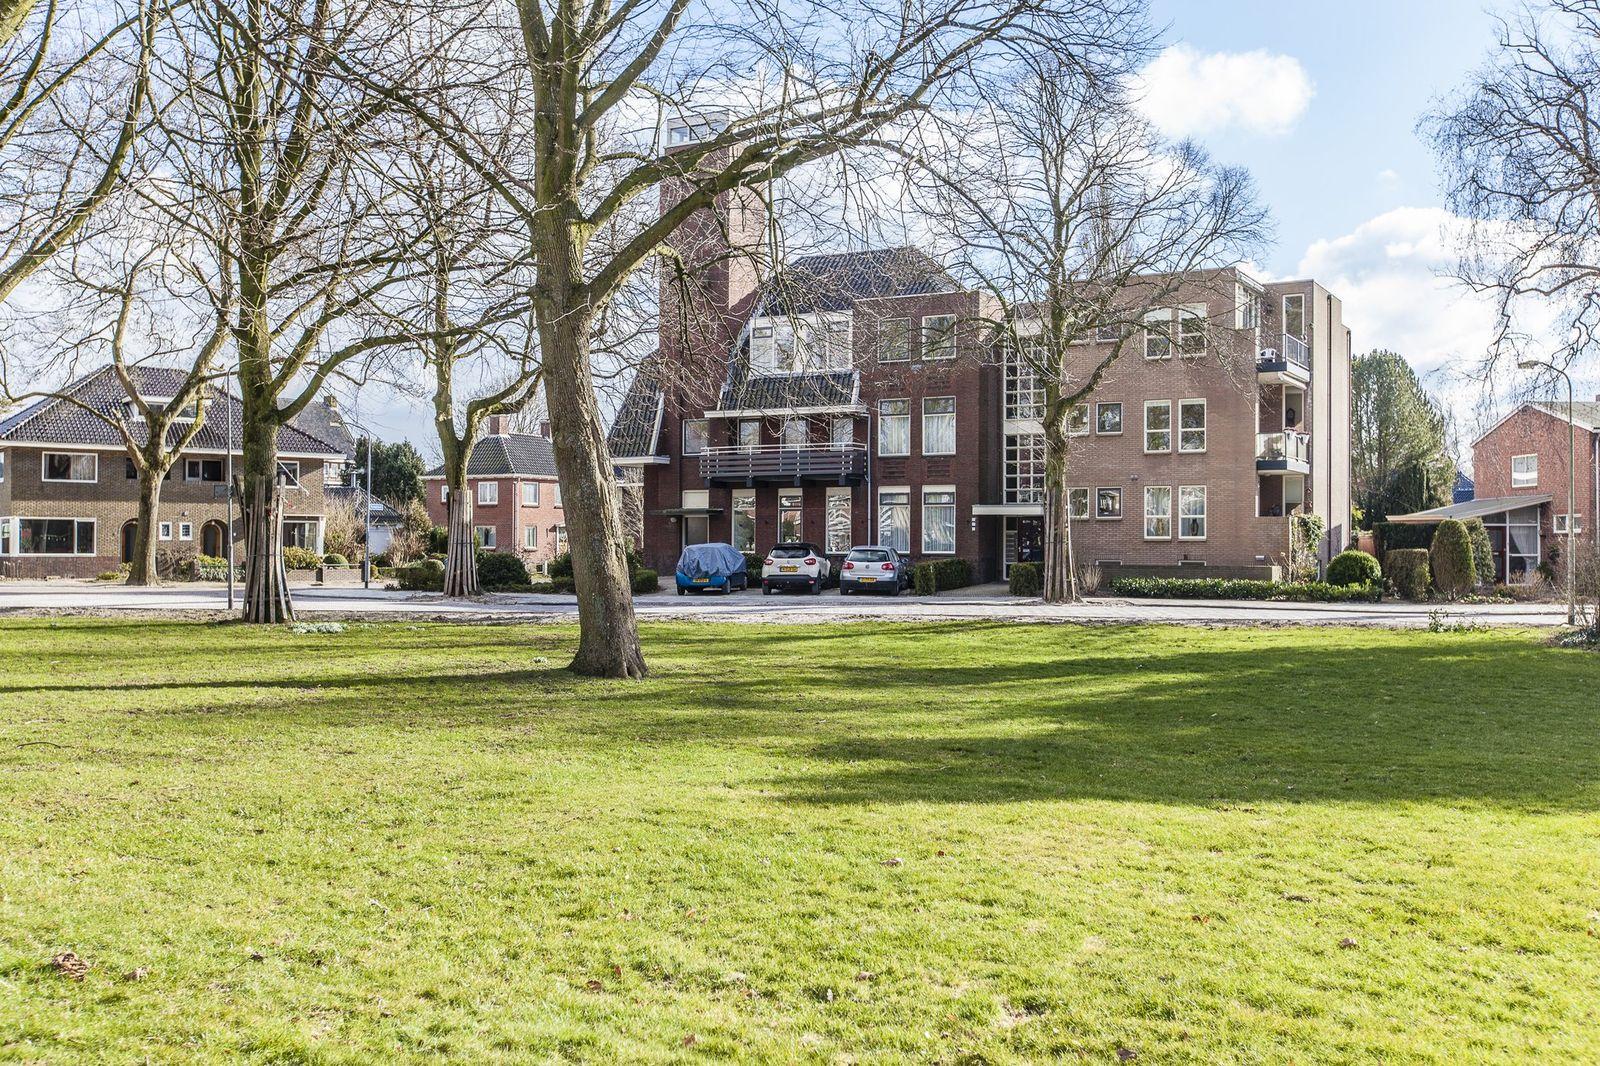 Burgemeester Bartelsstr 2-., Hoogezand